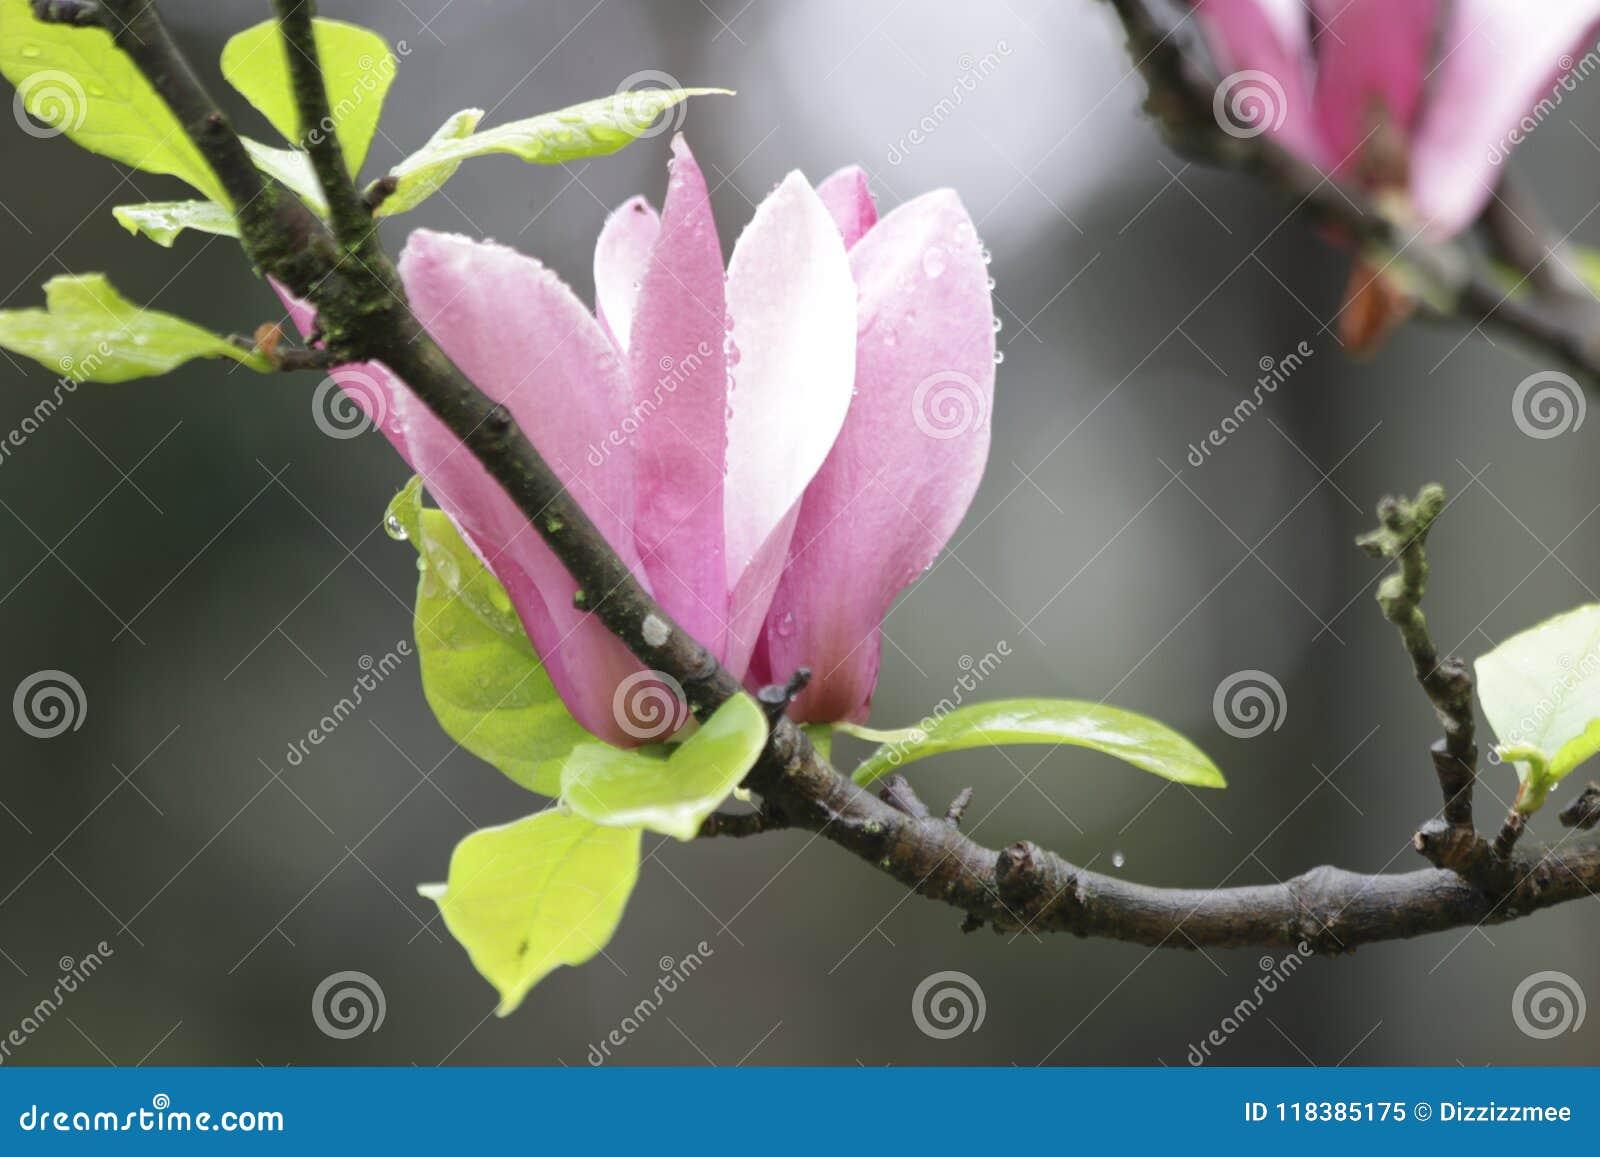 Rain Drops On Pink Magnolia Flower Spring Season Stock Image